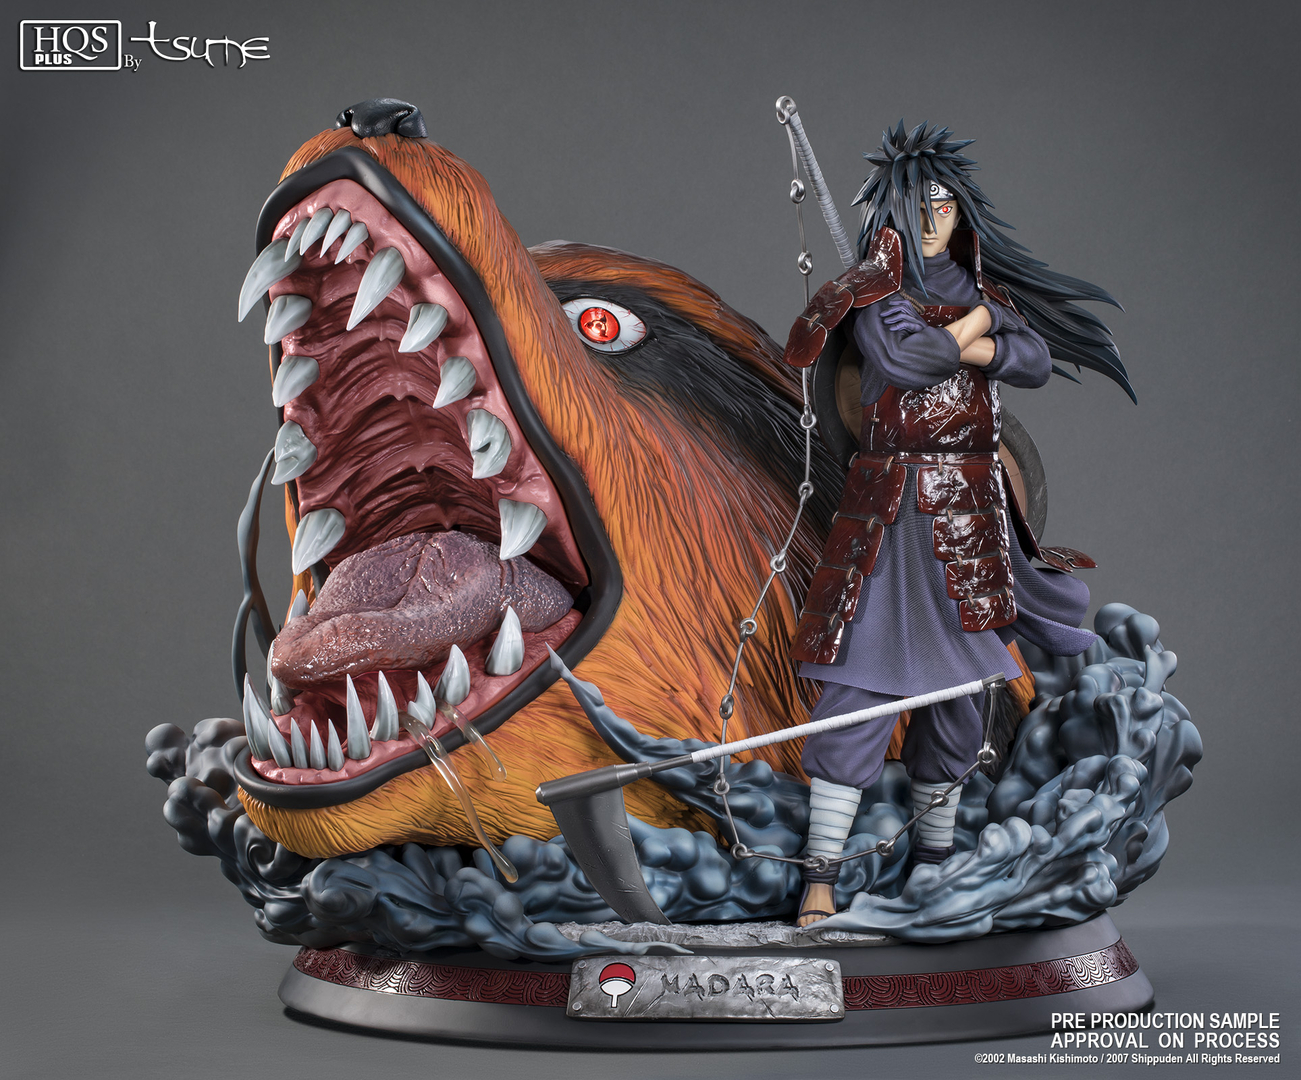 Statue Naruto Shippuden Madara Uchiha HQS+ by Tsume 1001 Figurines 1